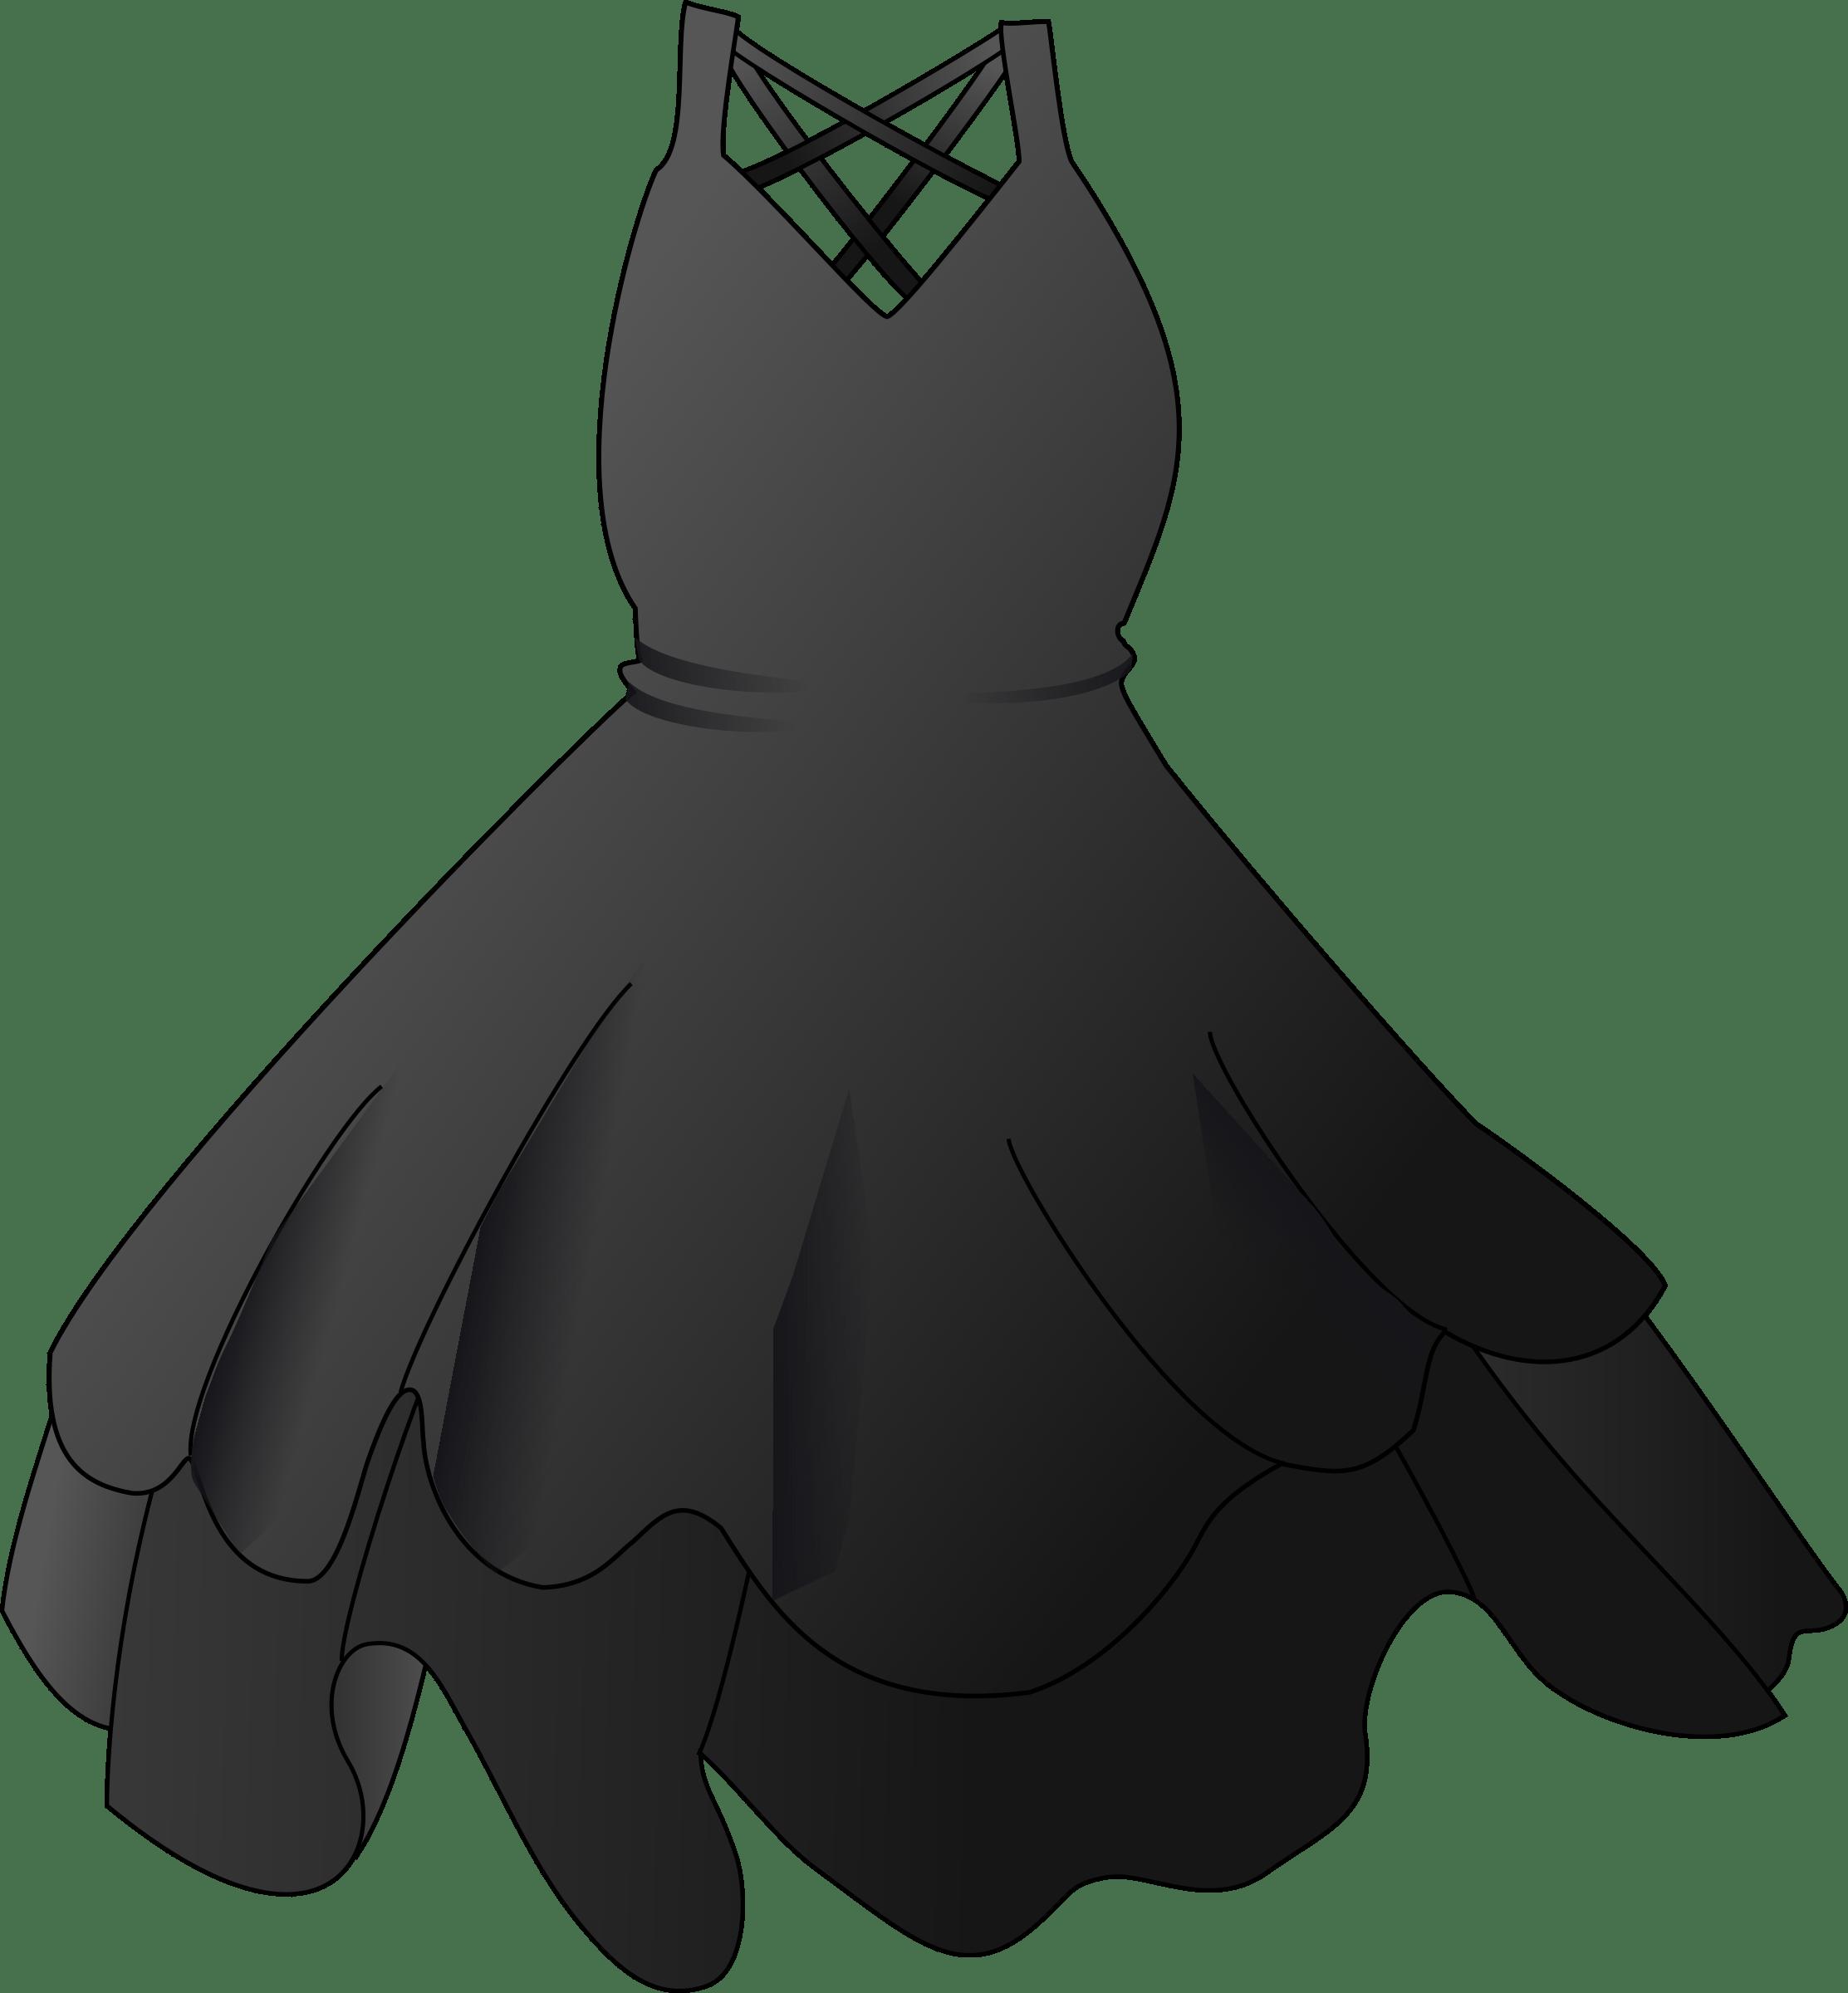 Black party dress transparent. Costume clipart clothing